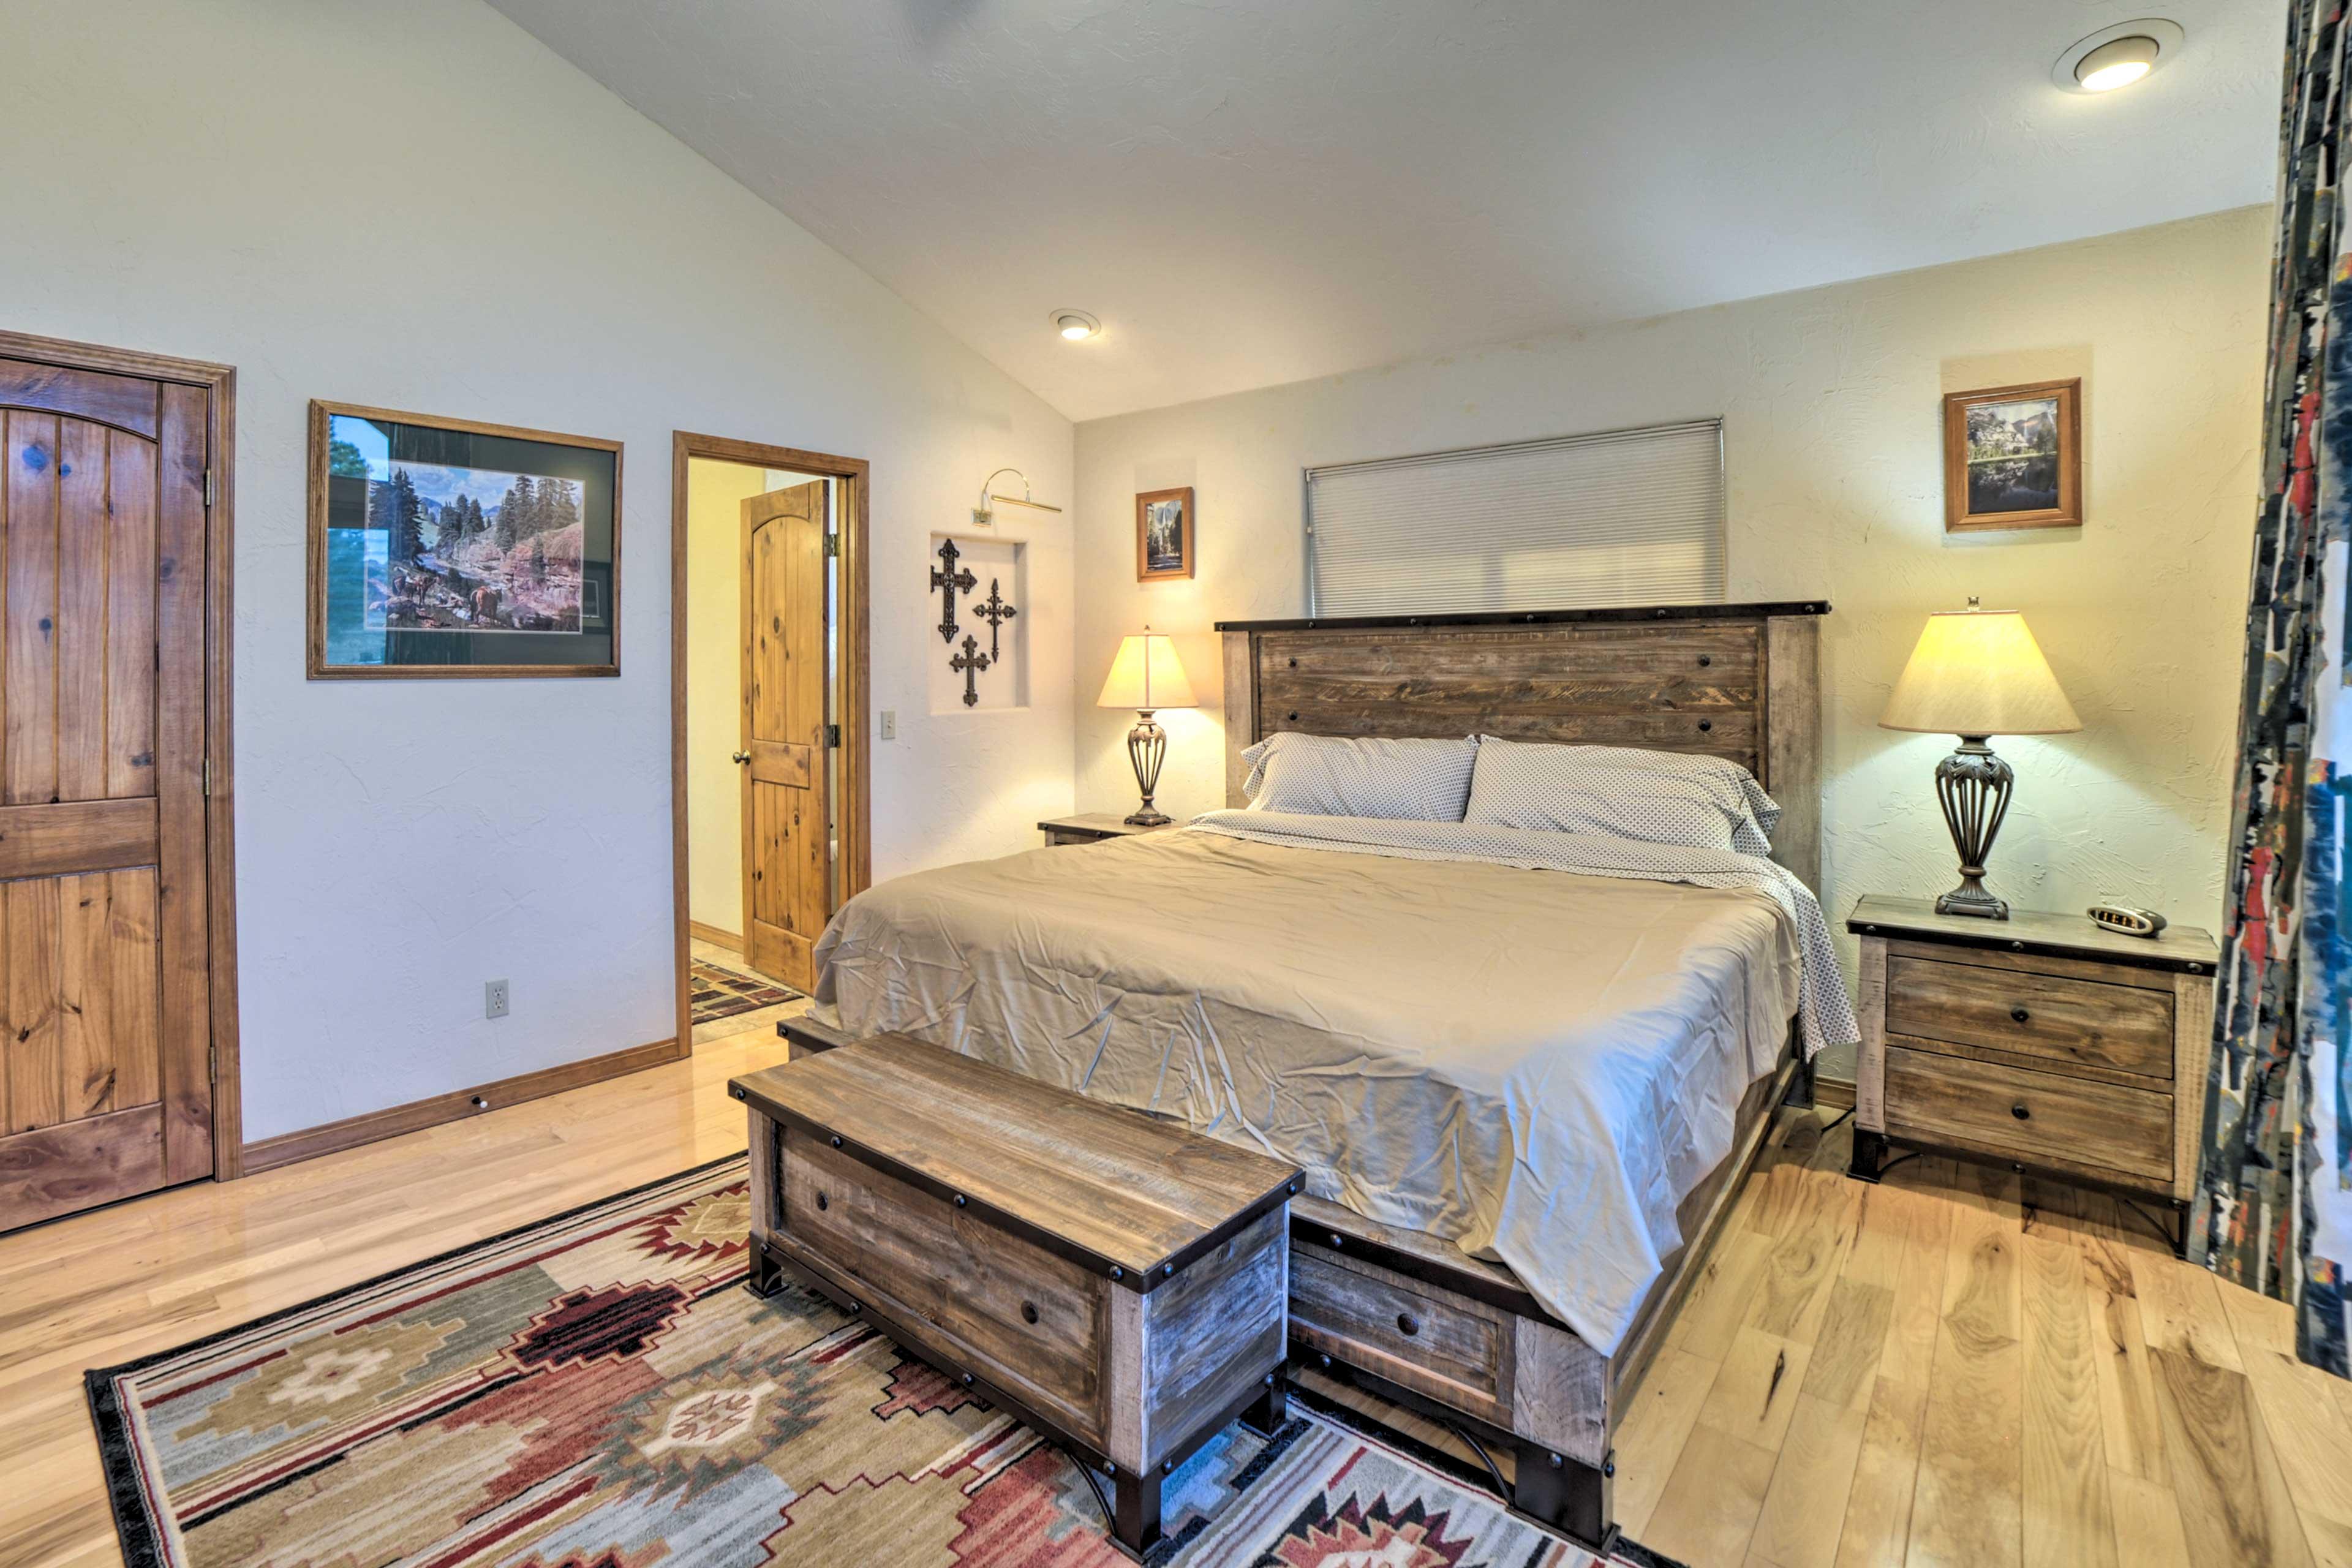 The room includes an en-suite bathroom.